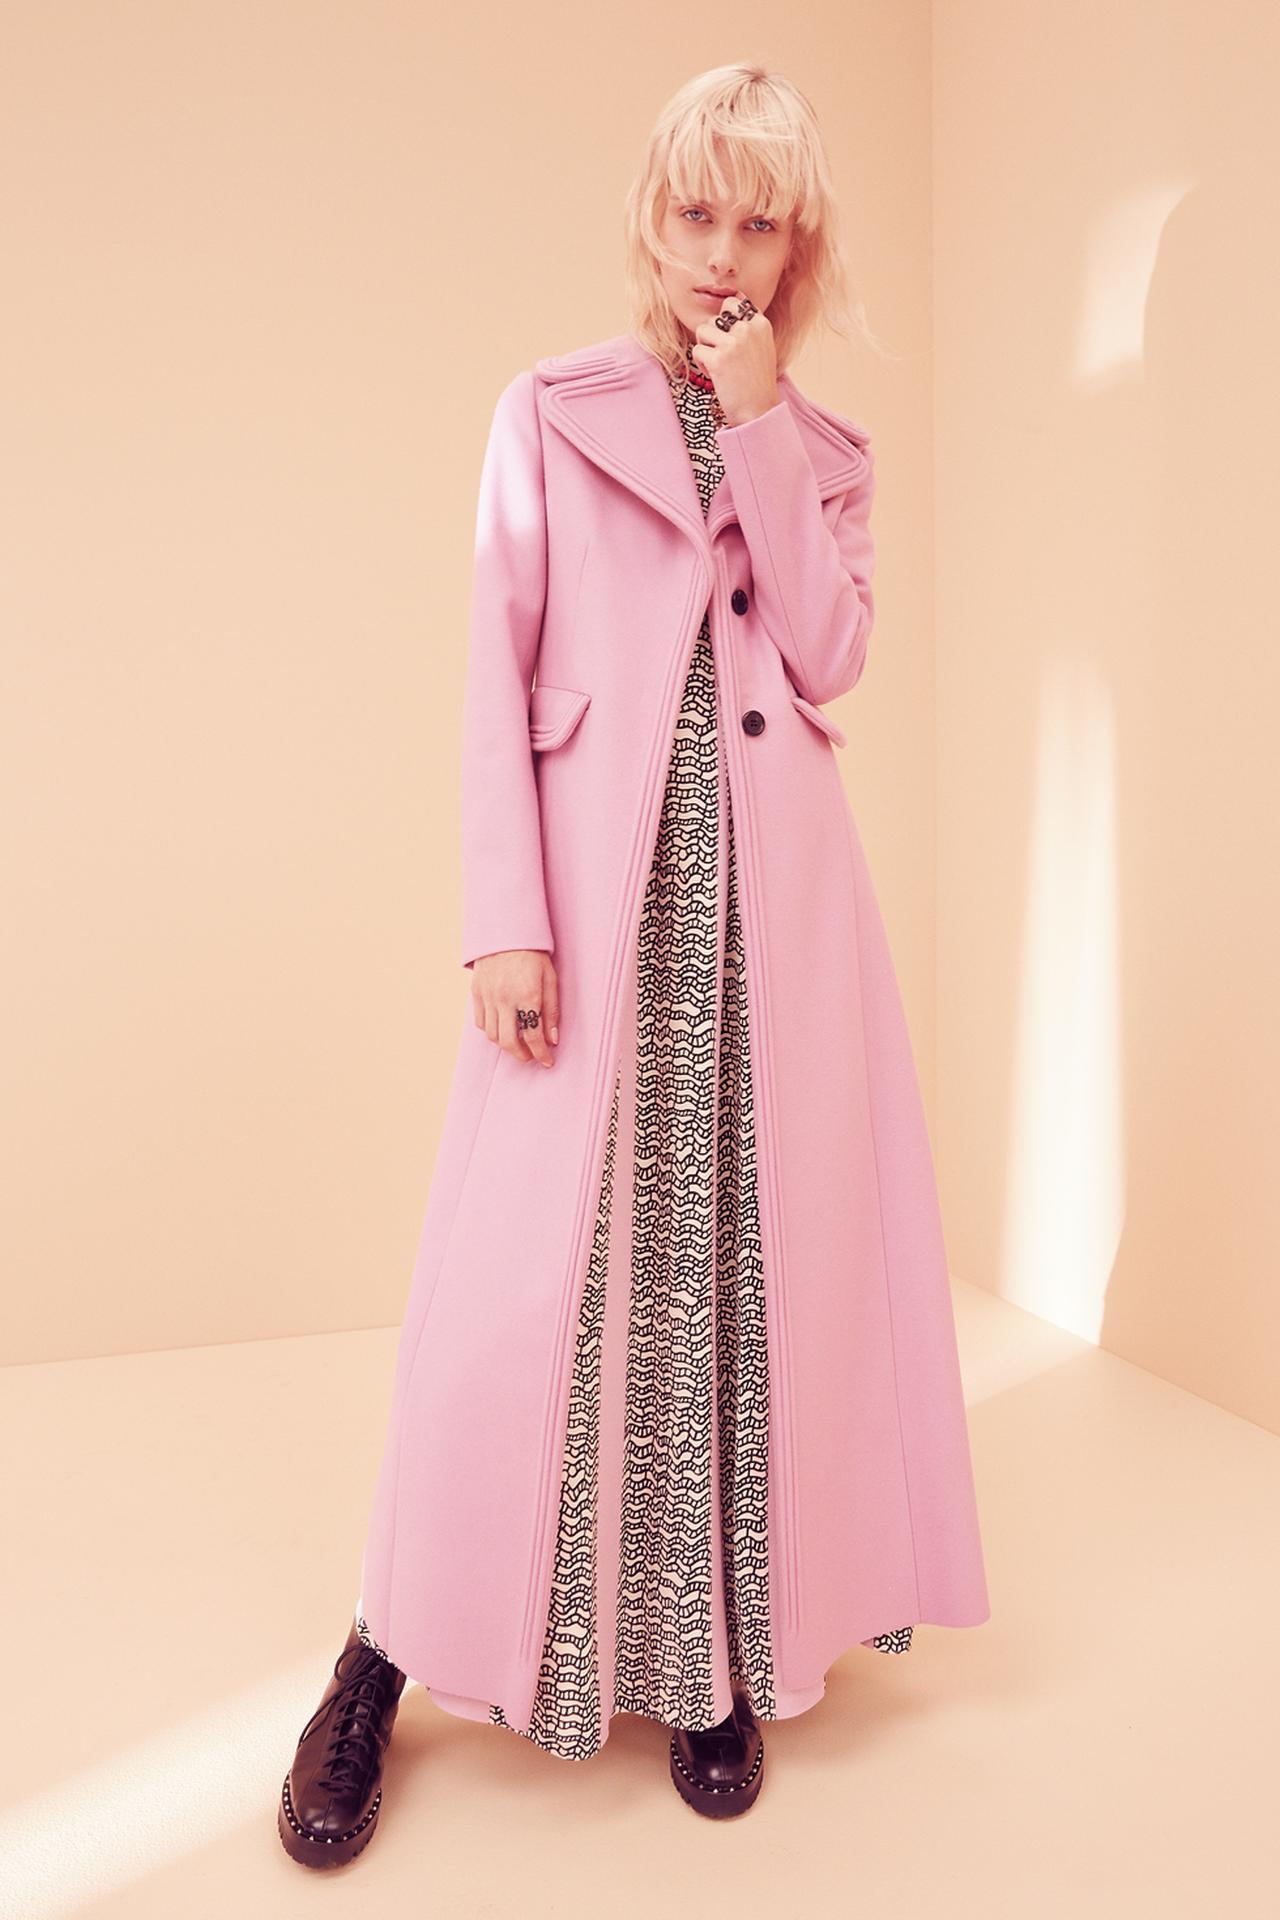 Images : 1番目の画像 - 「洗練のピンク」のアルバム - T JAPAN:The New York Times Style Magazine 公式サイト